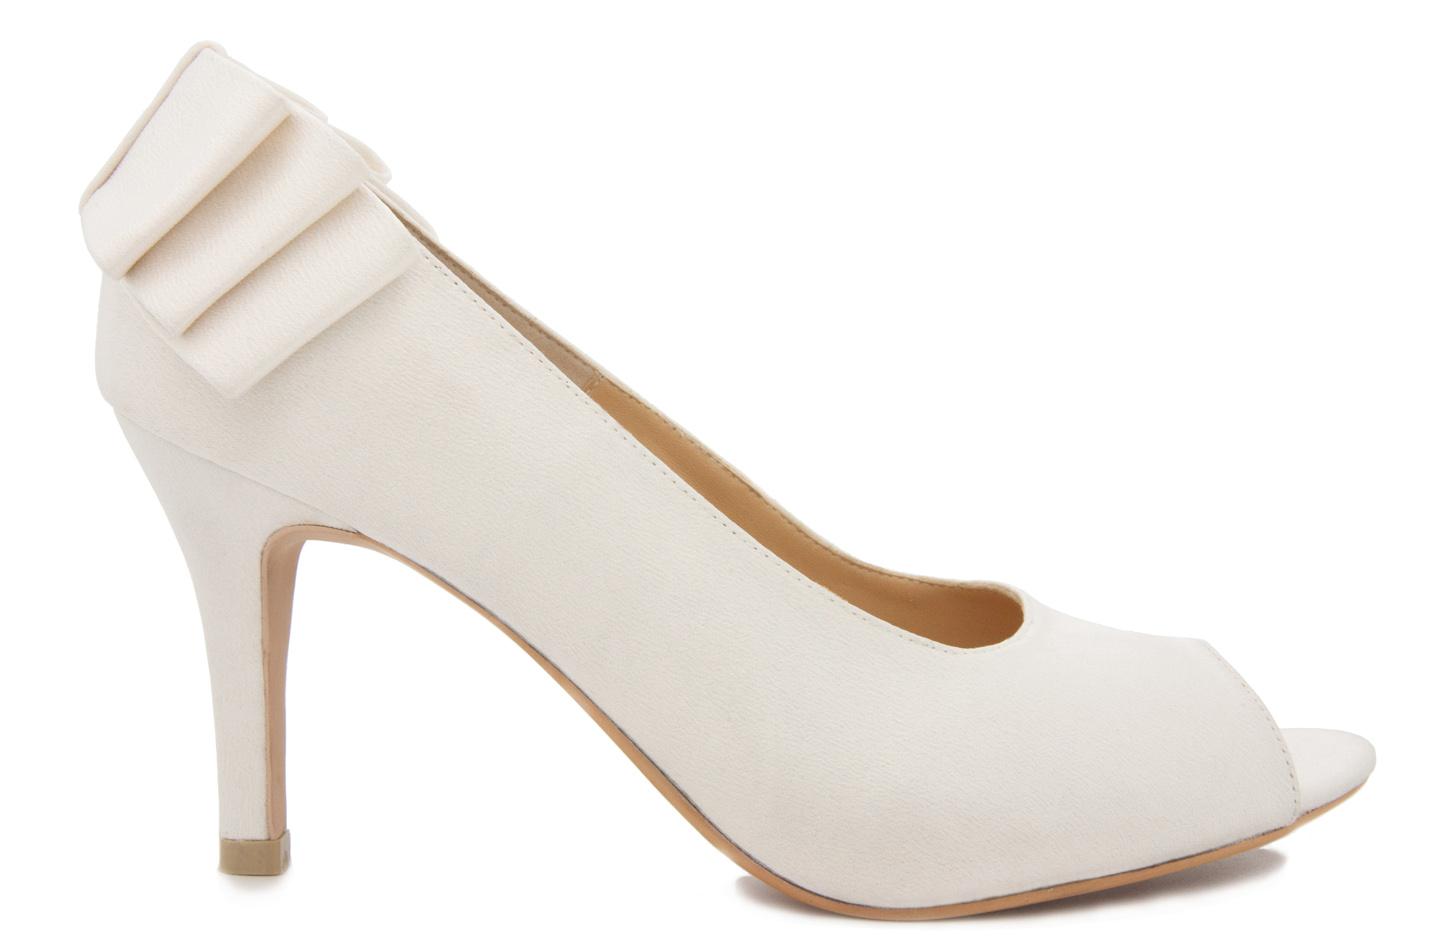 80256dfde1a4 Hilary Ivory White Satin Bow Wedding Shoes